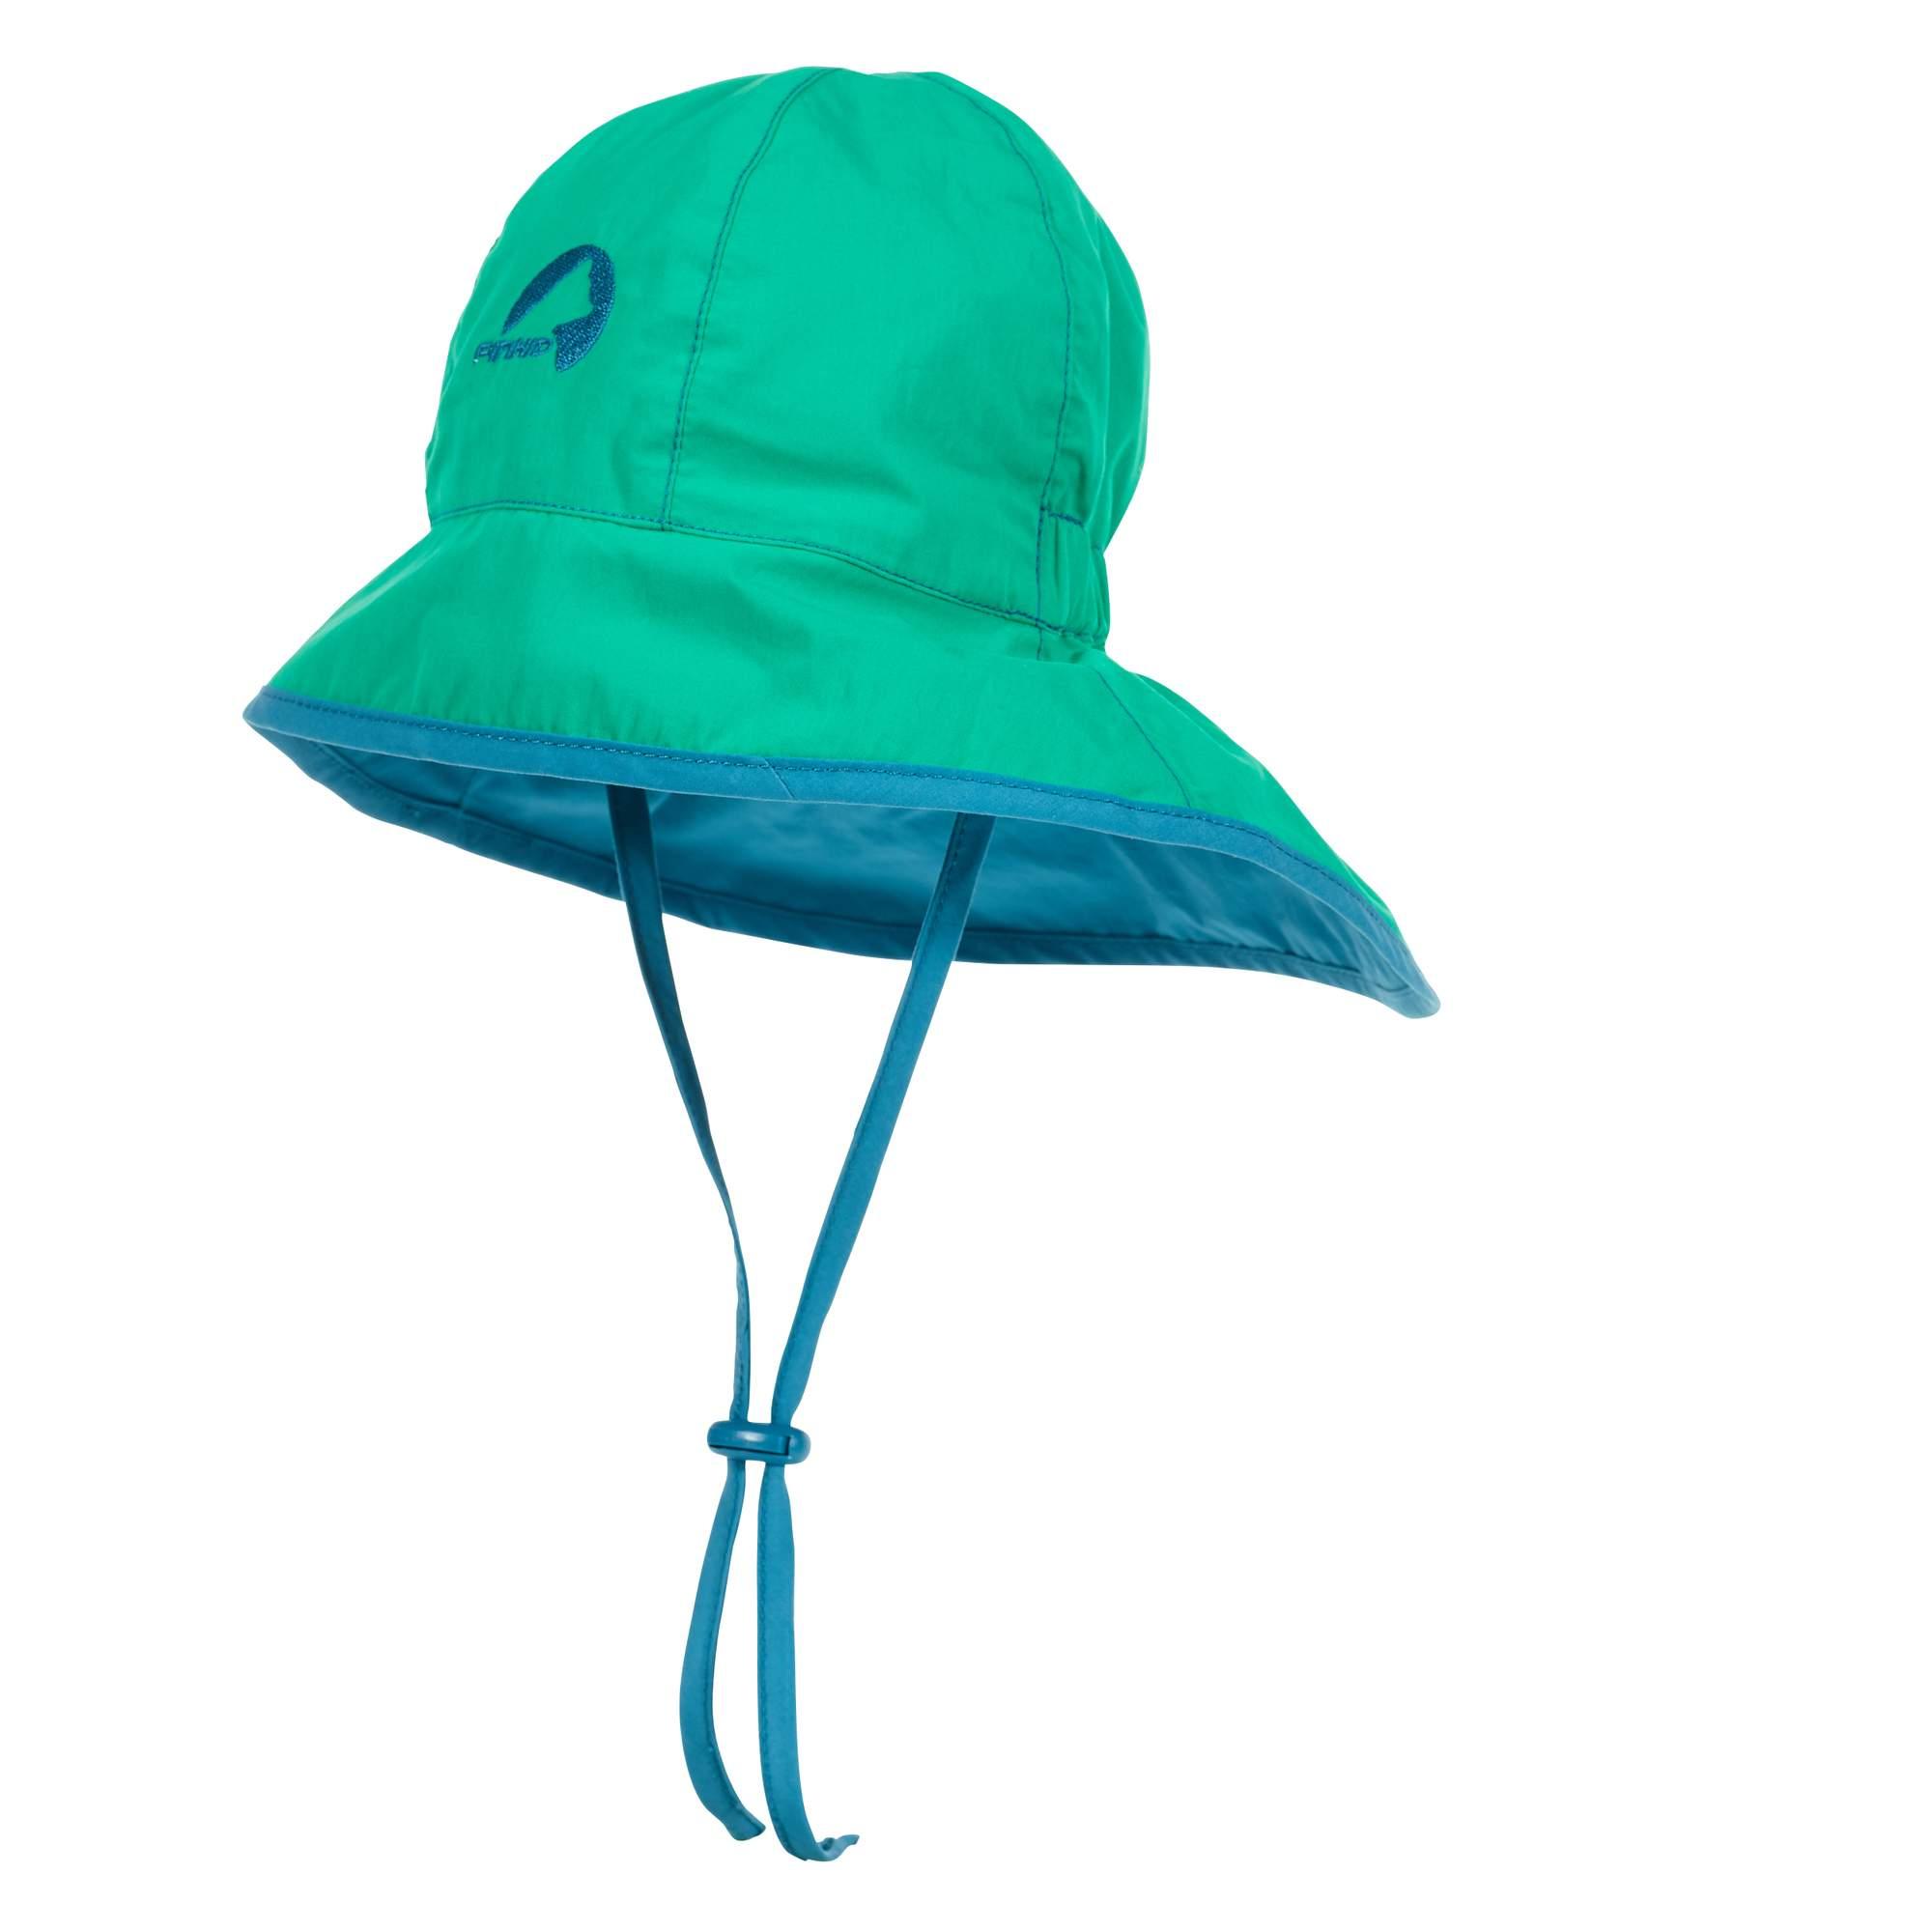 Finkid Ranta Sport Kinder Gr. 50 cm - grün / emerald/mosaic - Hüte 6031099